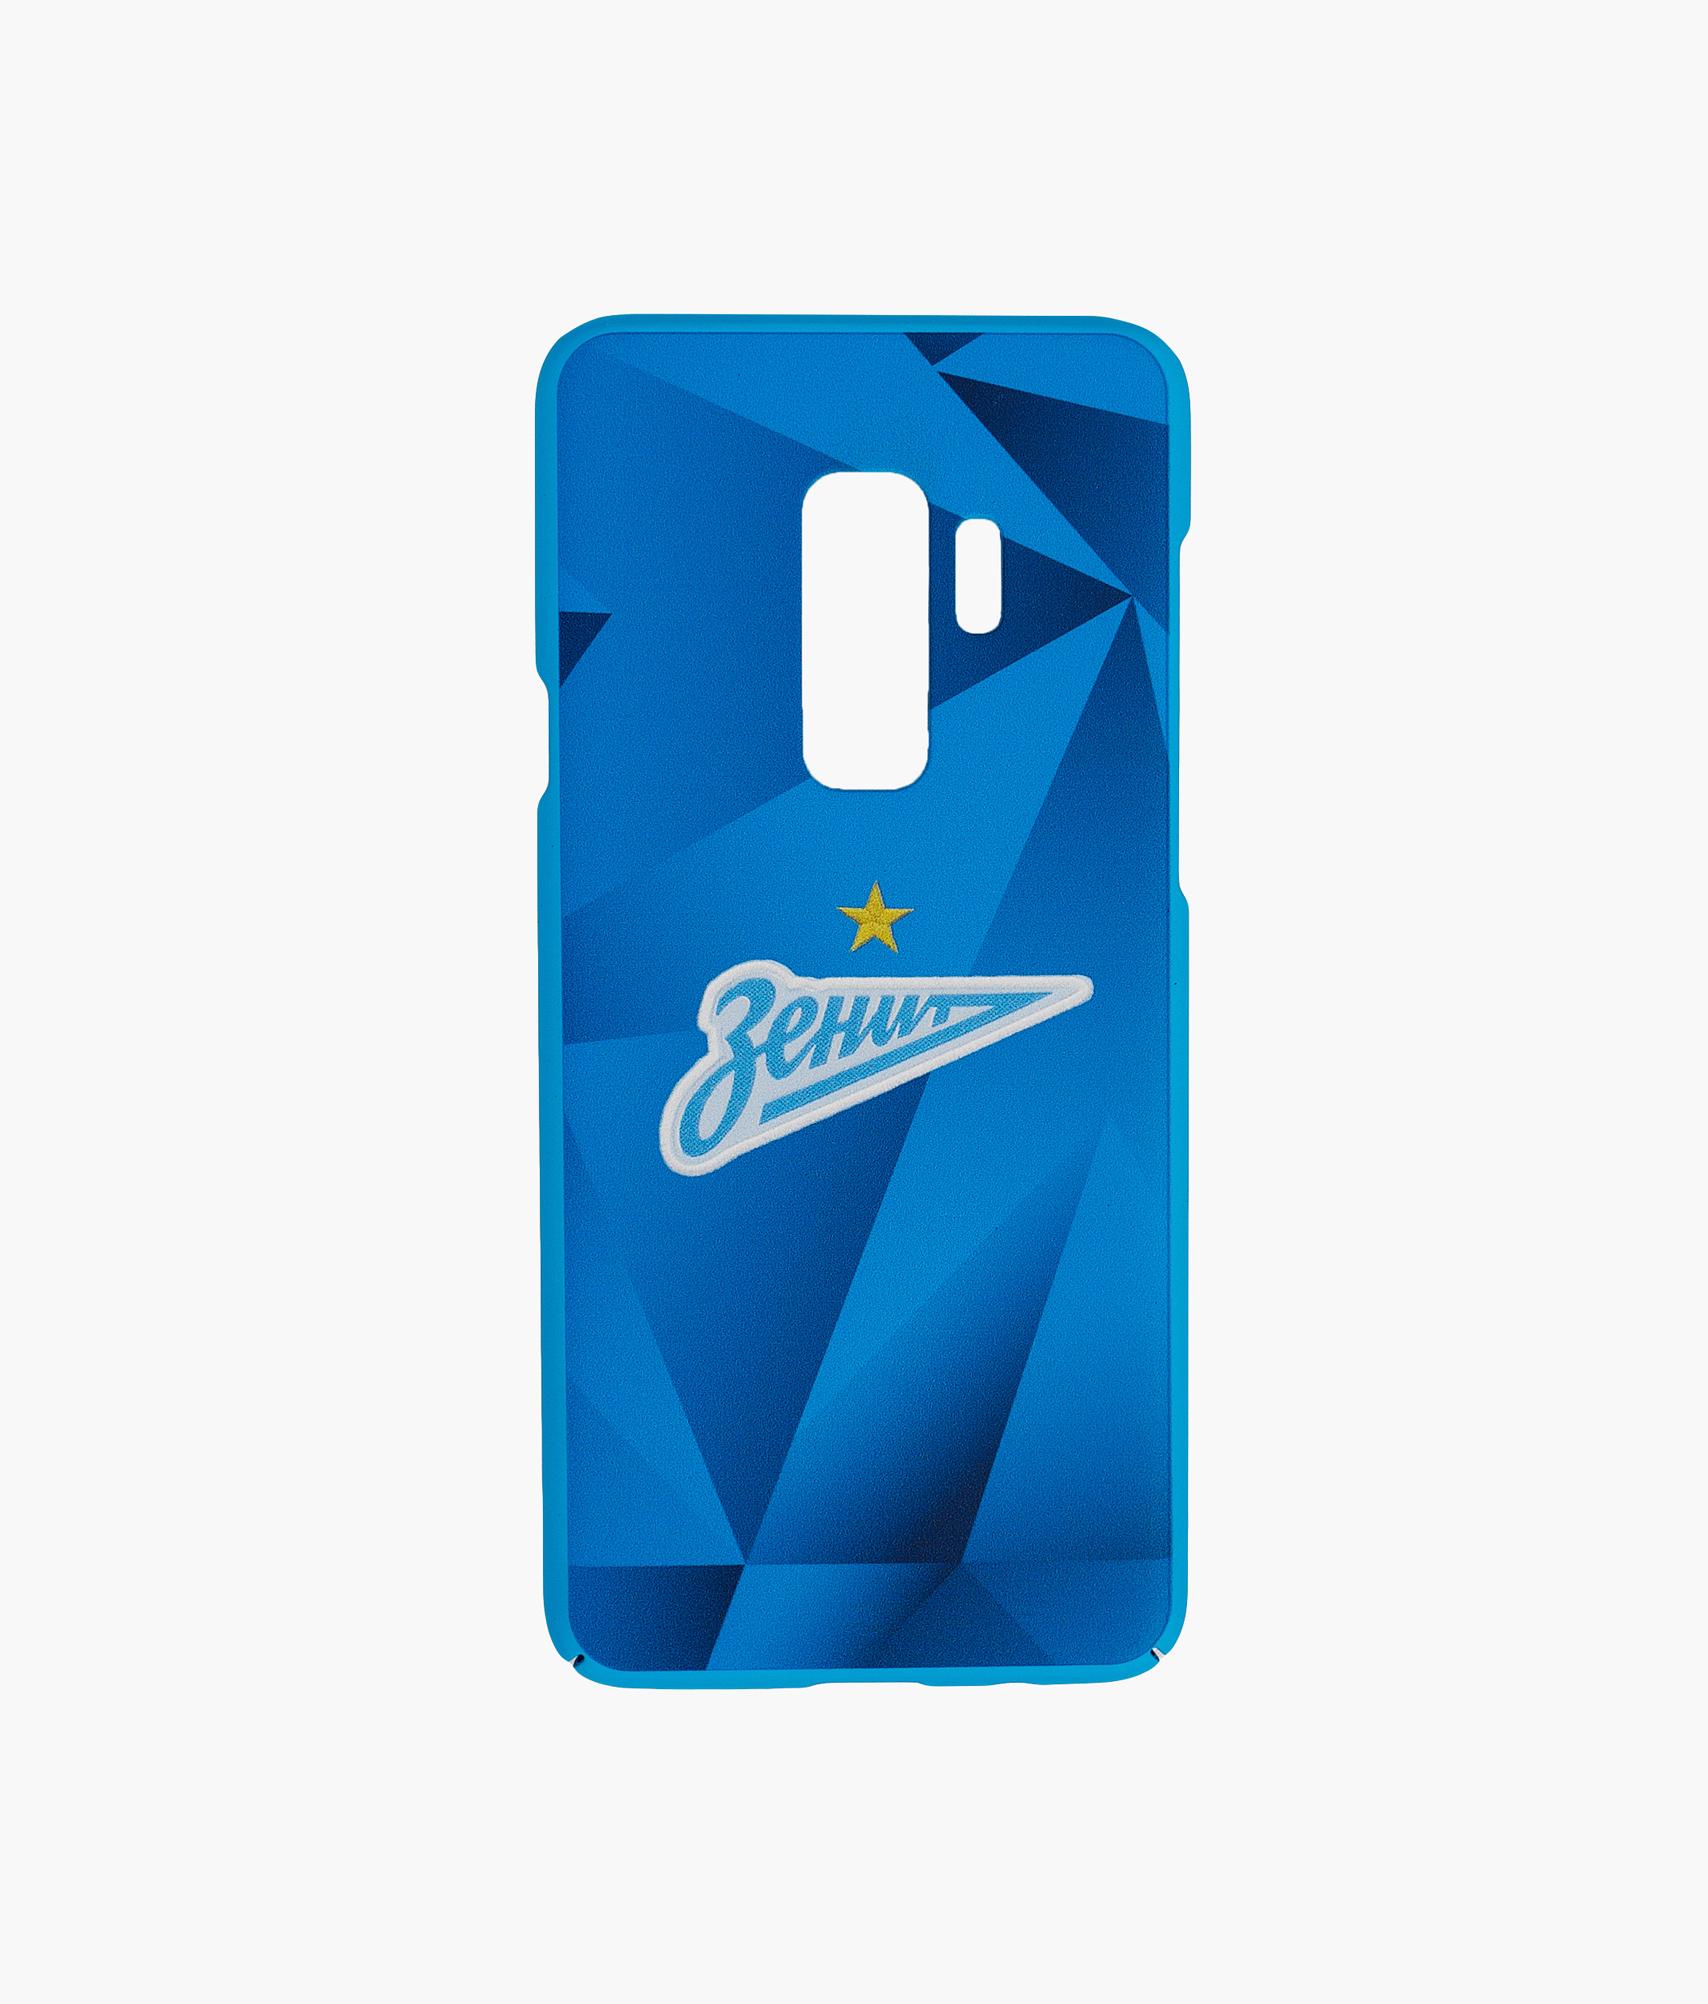 Фото - Чехол для Samsung Galaxy S9 Plus «Форма 2019/20» Зенит Цвет-Синий аксессуар чехол neypo для samsung galaxy a70 2019 premium silver nsb11648